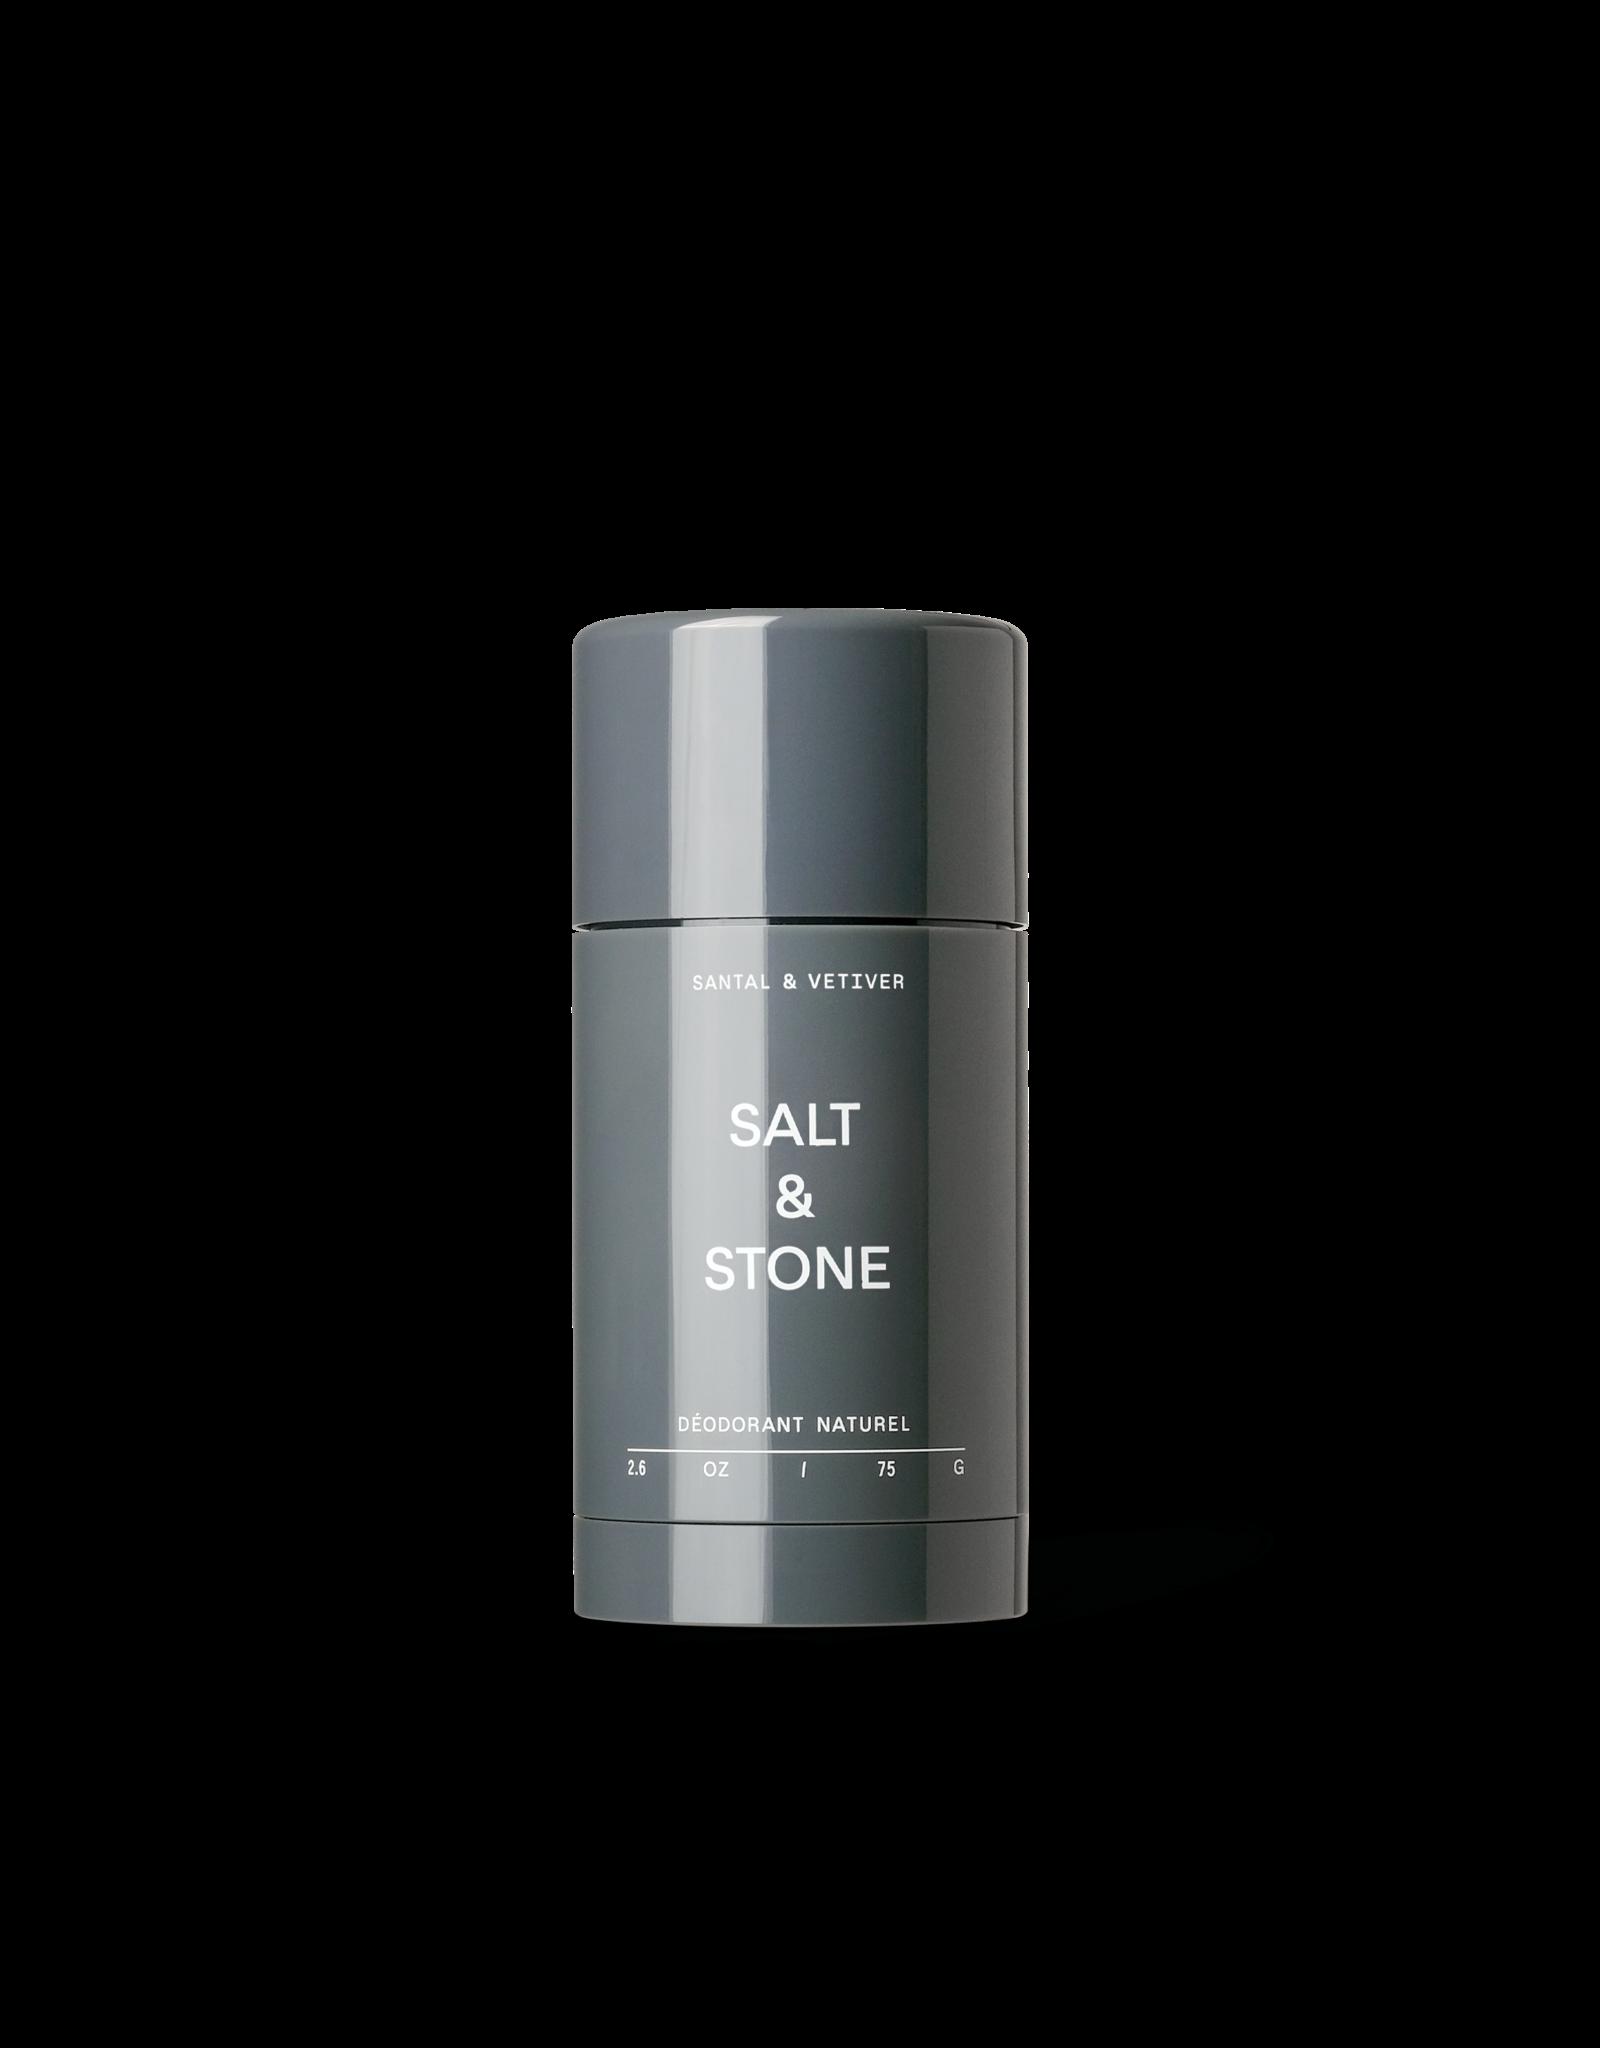 Salt & Stone Vetiver & Sandalwood Natural Deodorant - Formula No. 2